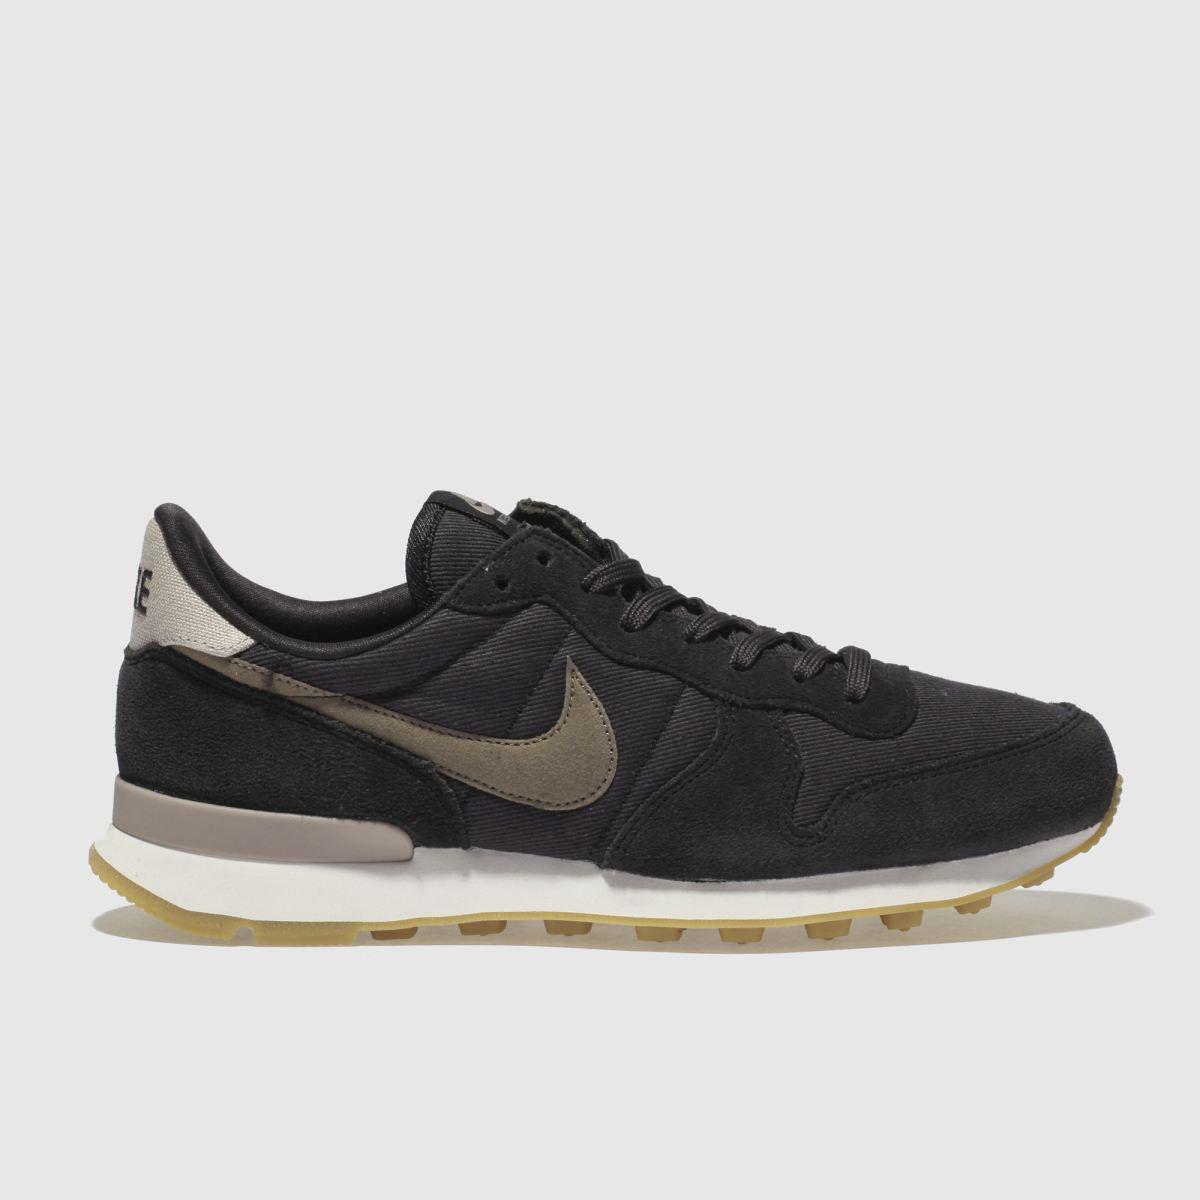 Nike Dark Grey Internationalist Se Trainers